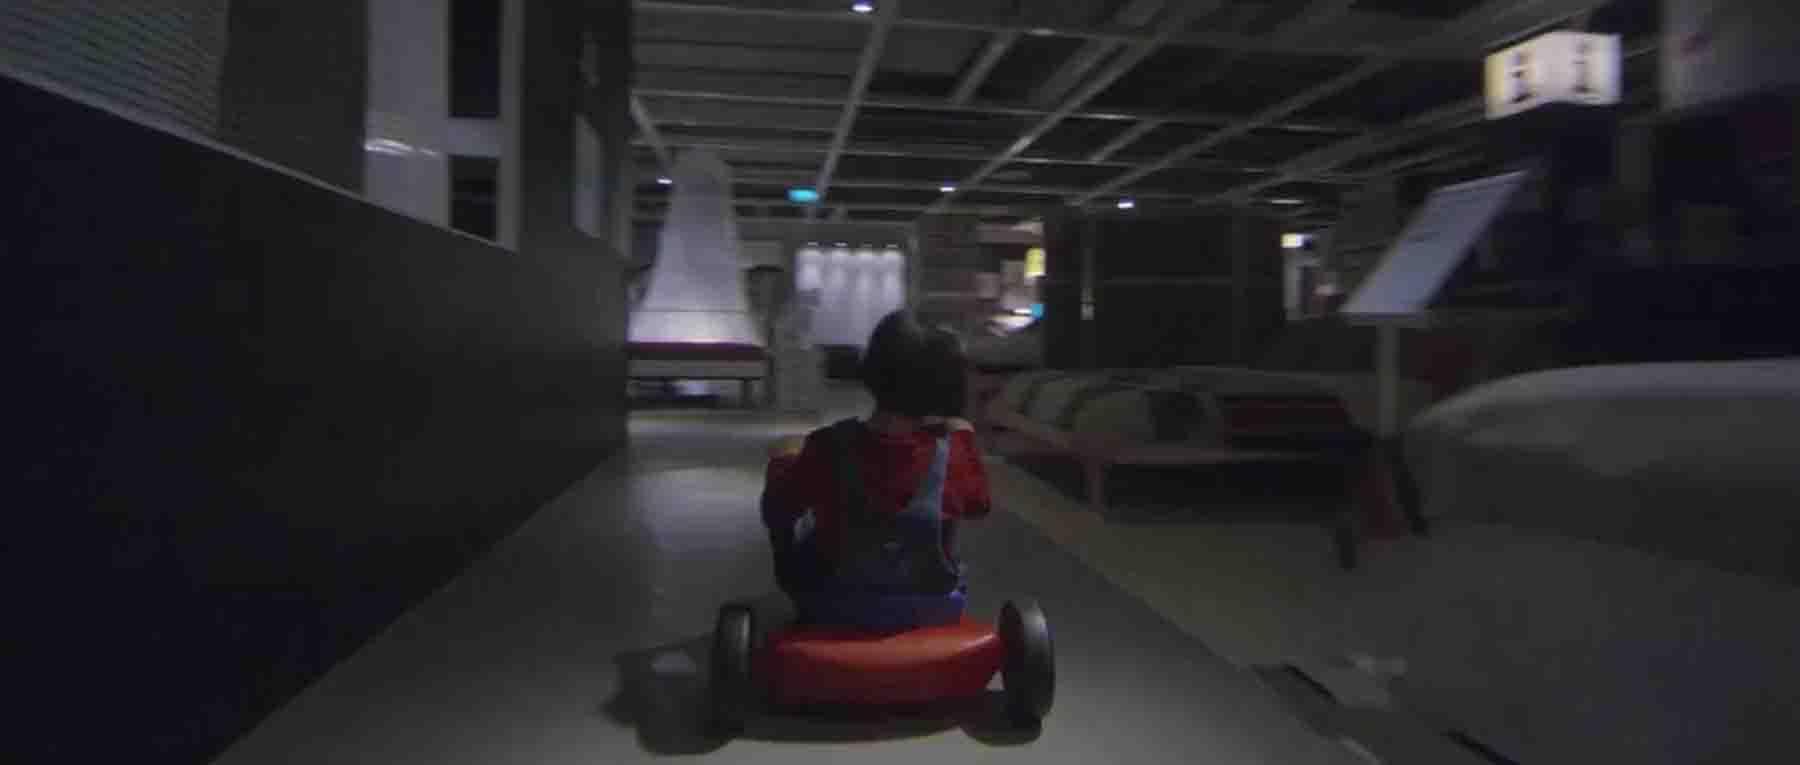 What if 'The Shining' was set in an Ikea Showroom? http://t.co/VxWuTjRwZy http://t.co/07aJ0iwsGr